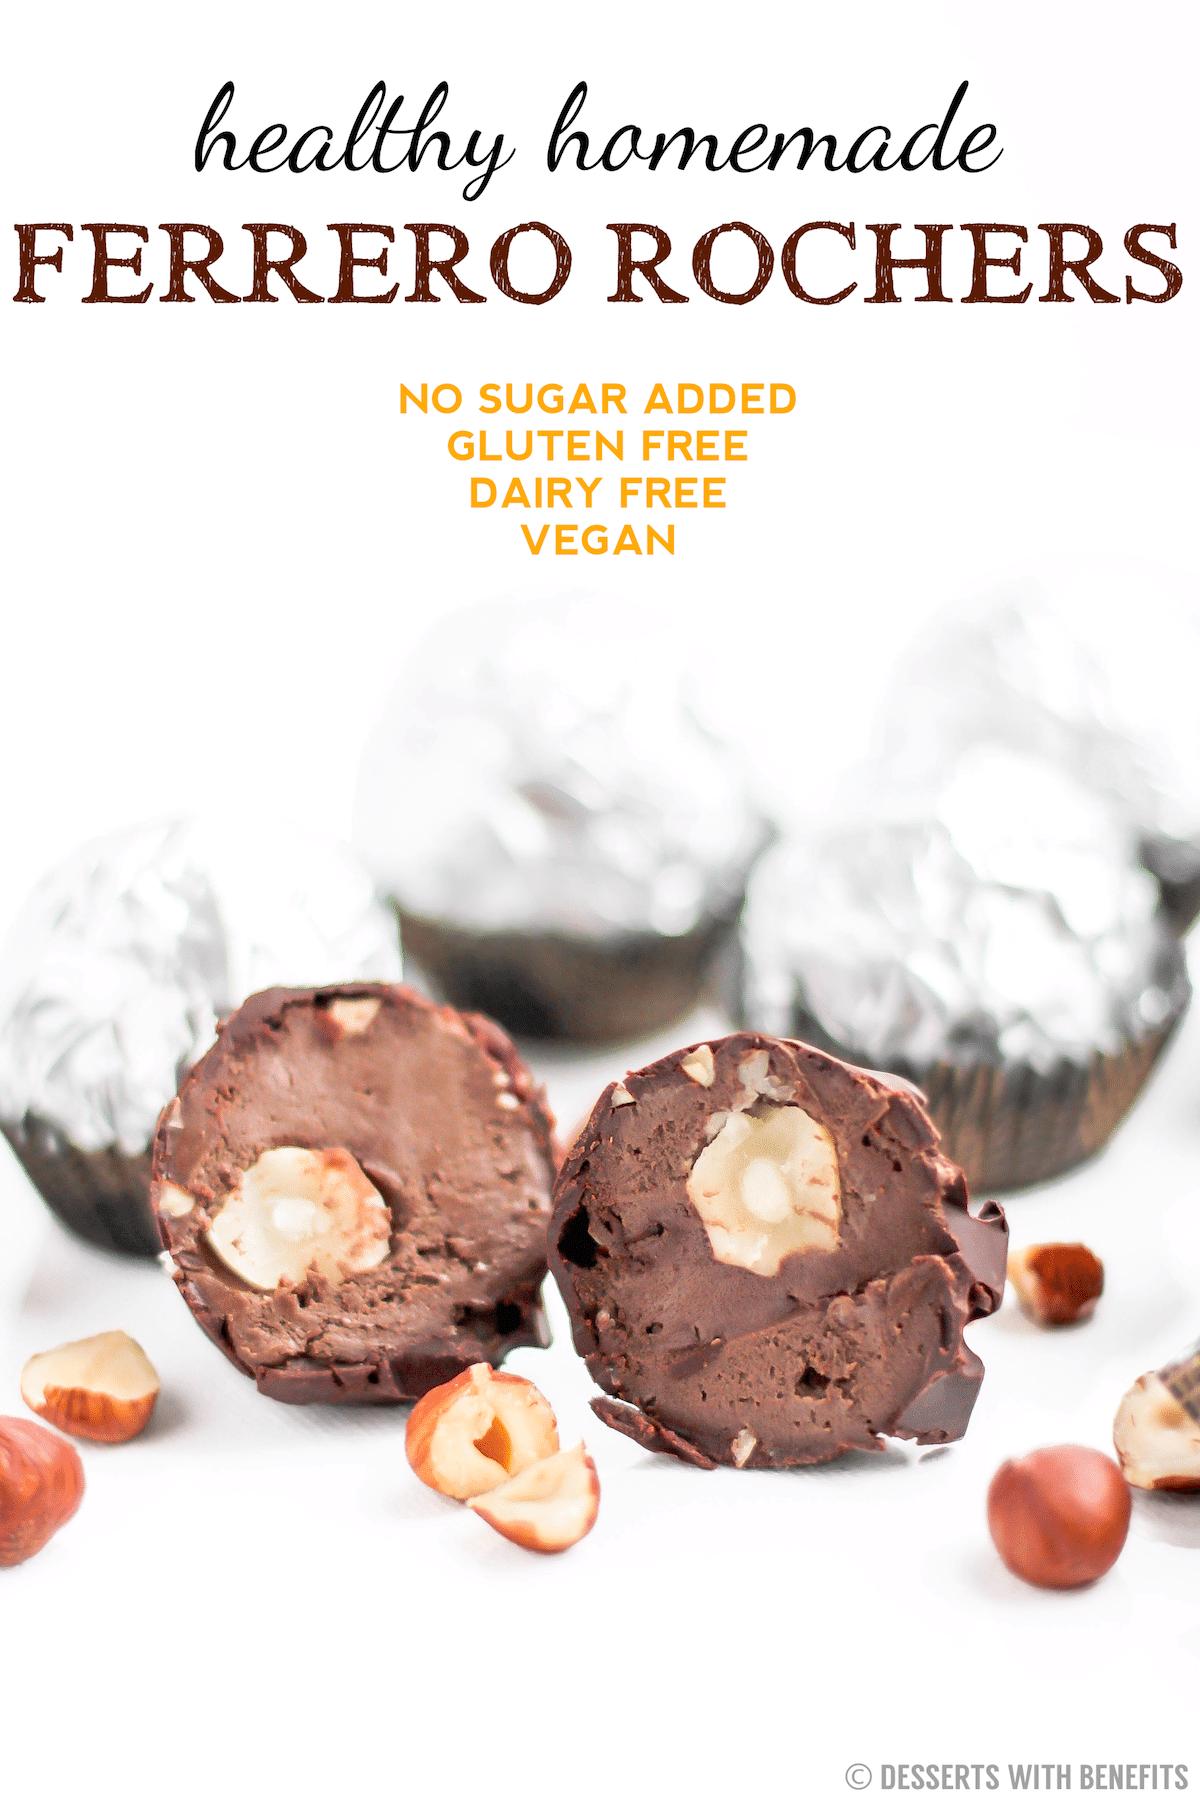 Healthy Homemade Ferrero Rochers recipe (gluten free, dairy free, vegan) - Healthy Dessert Recipes at Desserts with Benefits